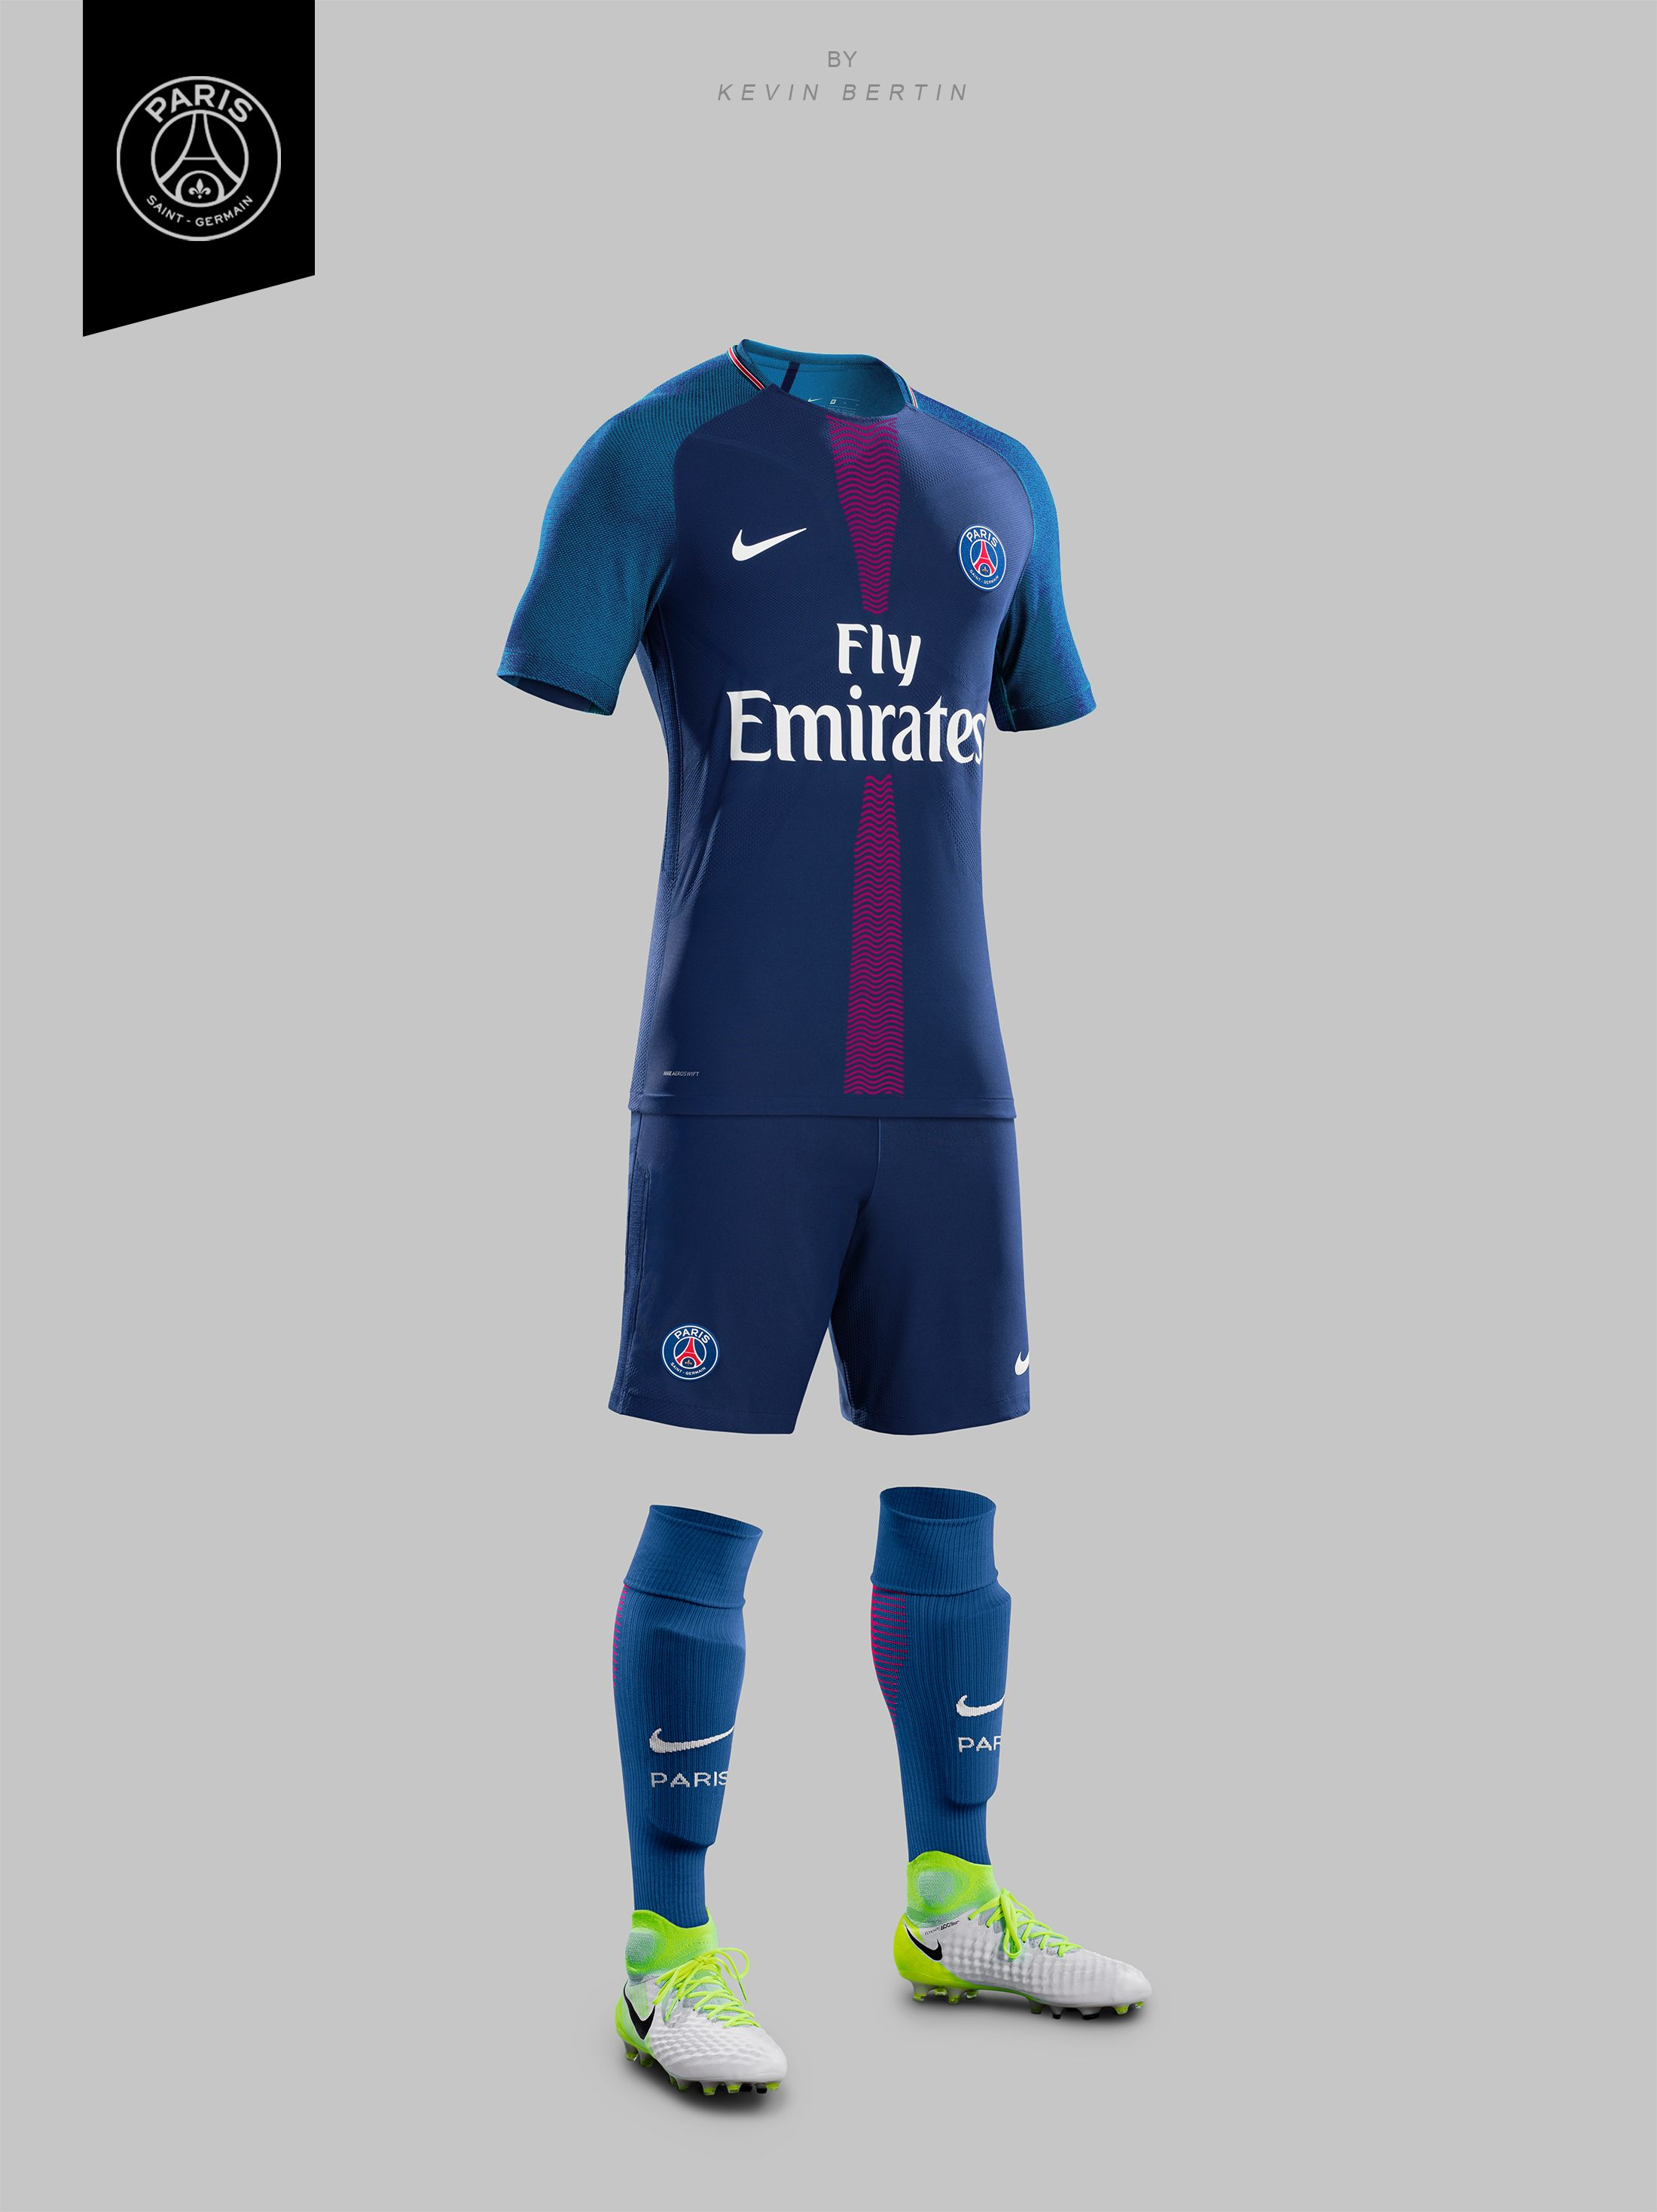 00897046b0 PSG Concept Design by Kevin Bertin Jersey Maillot 2018-2019 Kit Paris  Saint-Germain home